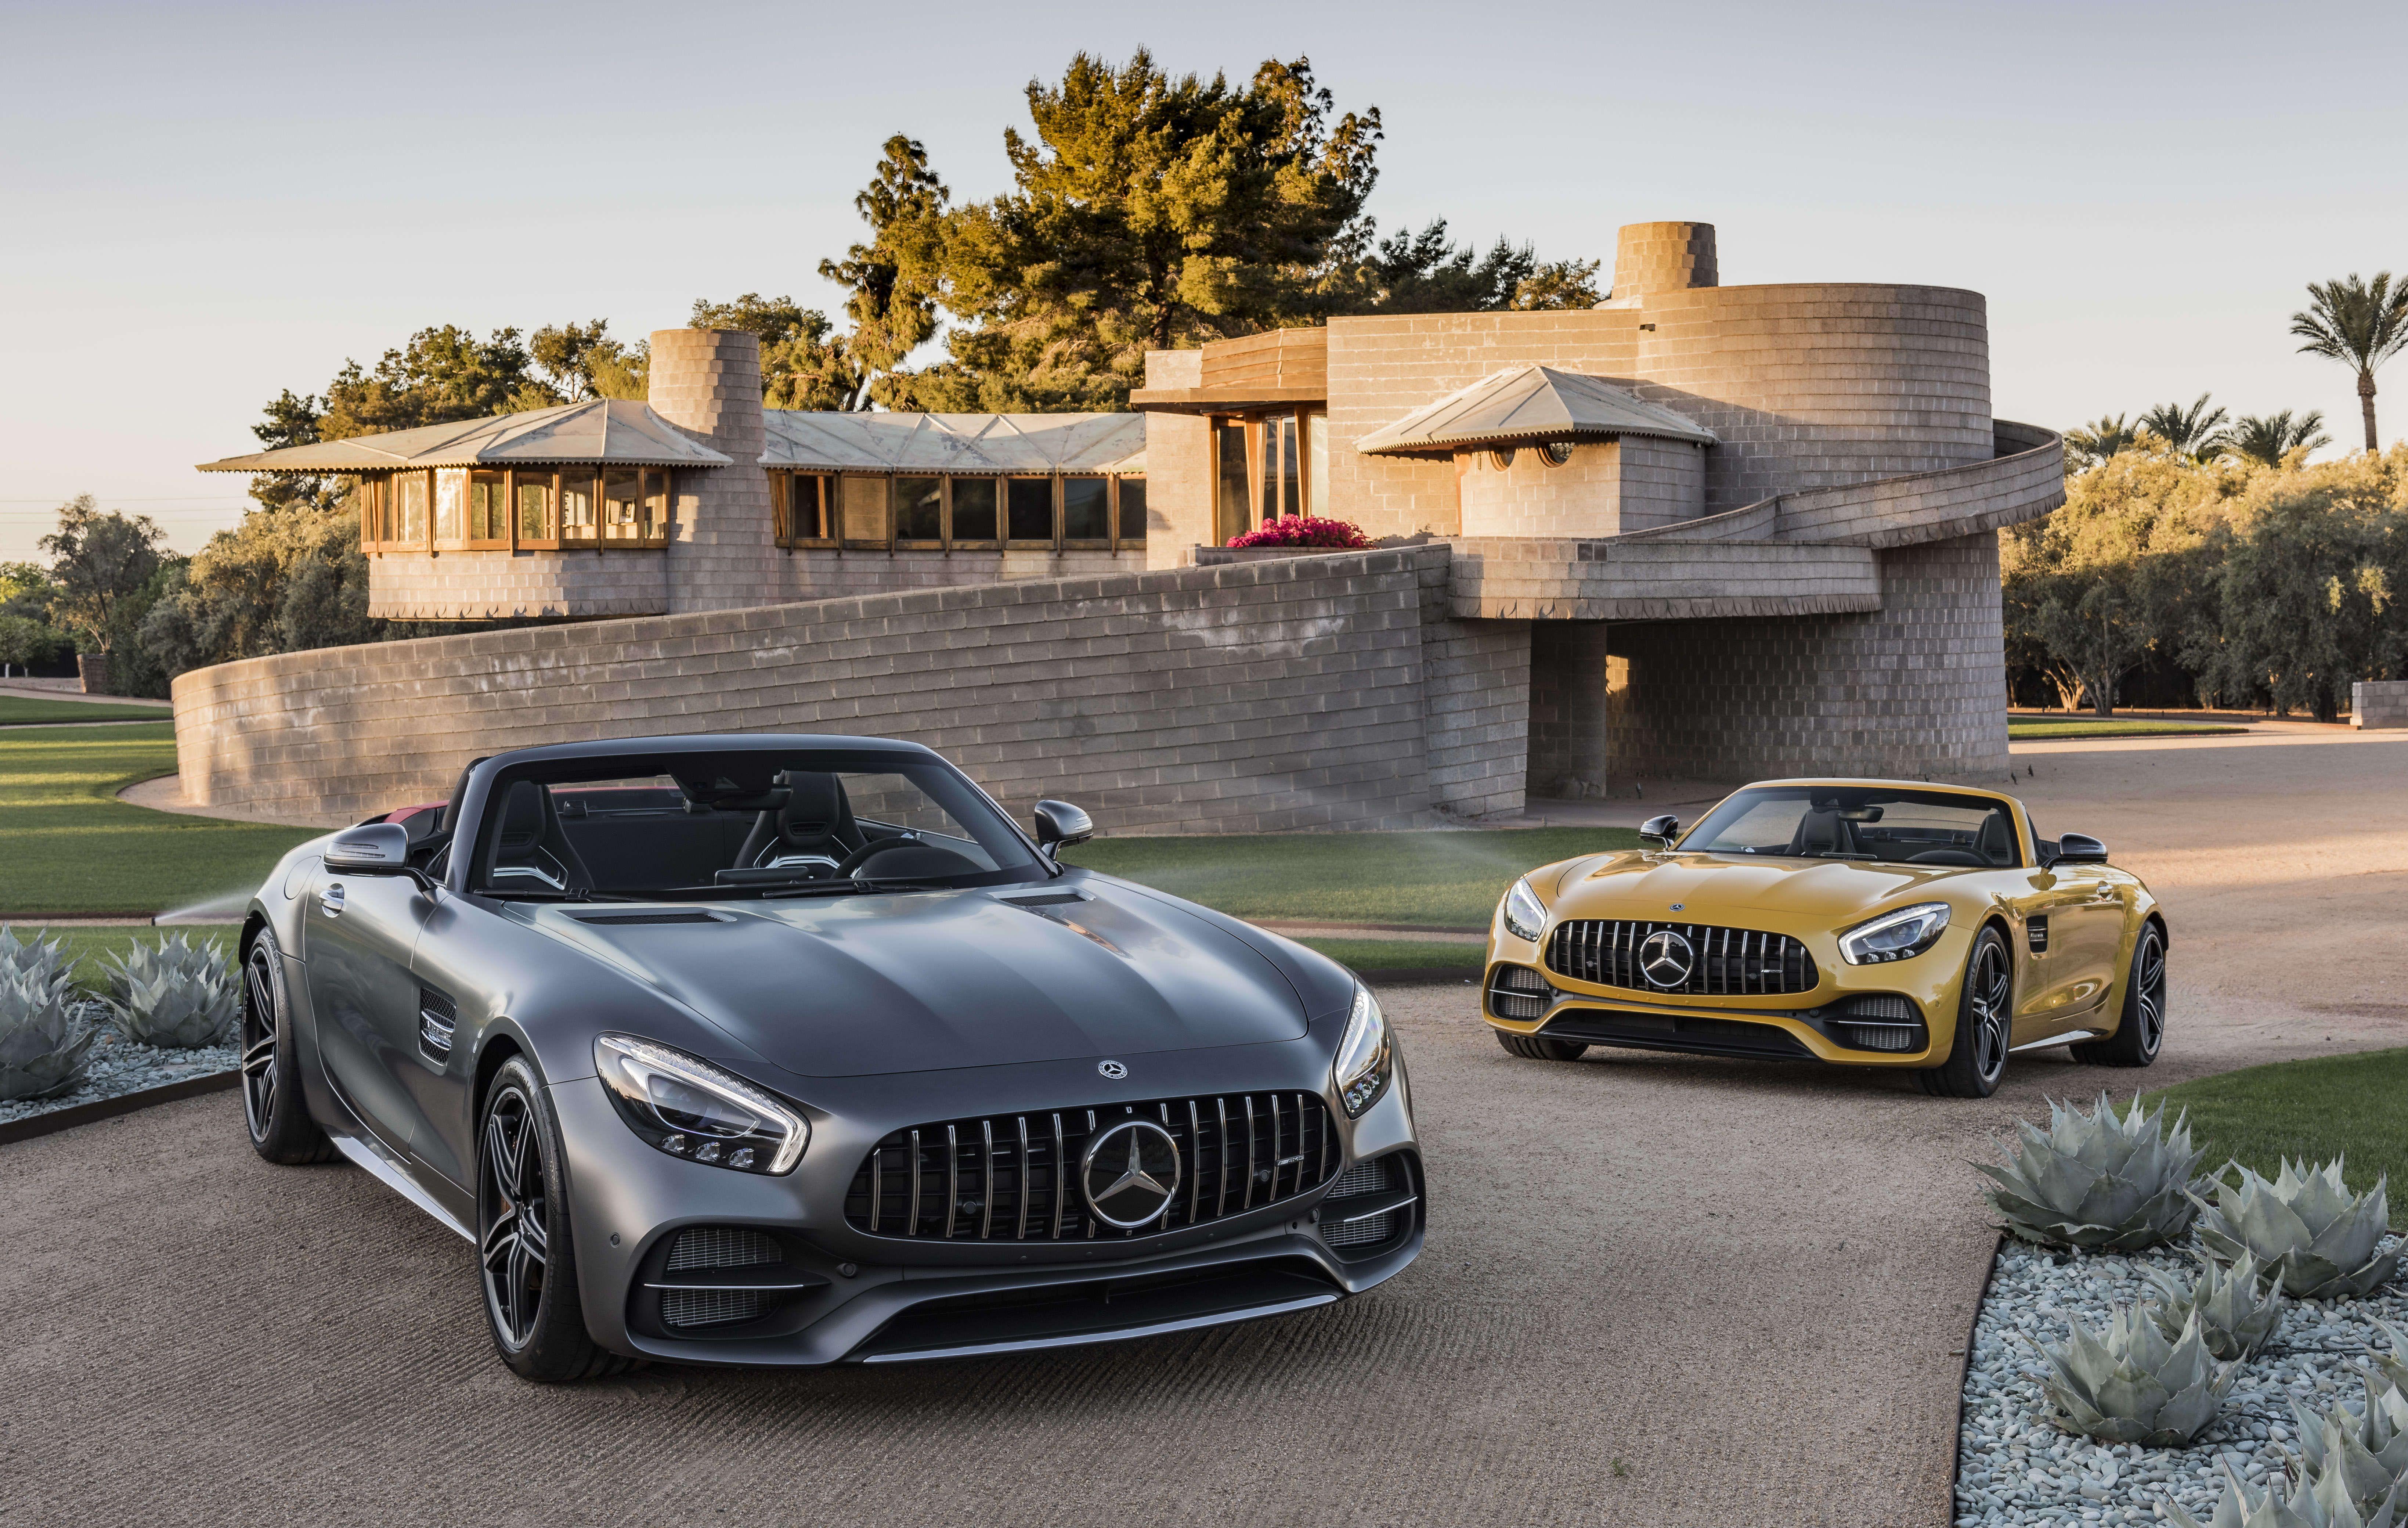 Interior mercedes amg gt s dtm safety car c190 2015 pr - 2018 Mercedes Amg Gt C Roadster First Drive Benz S True Sports Car Gets A Ragtop Option